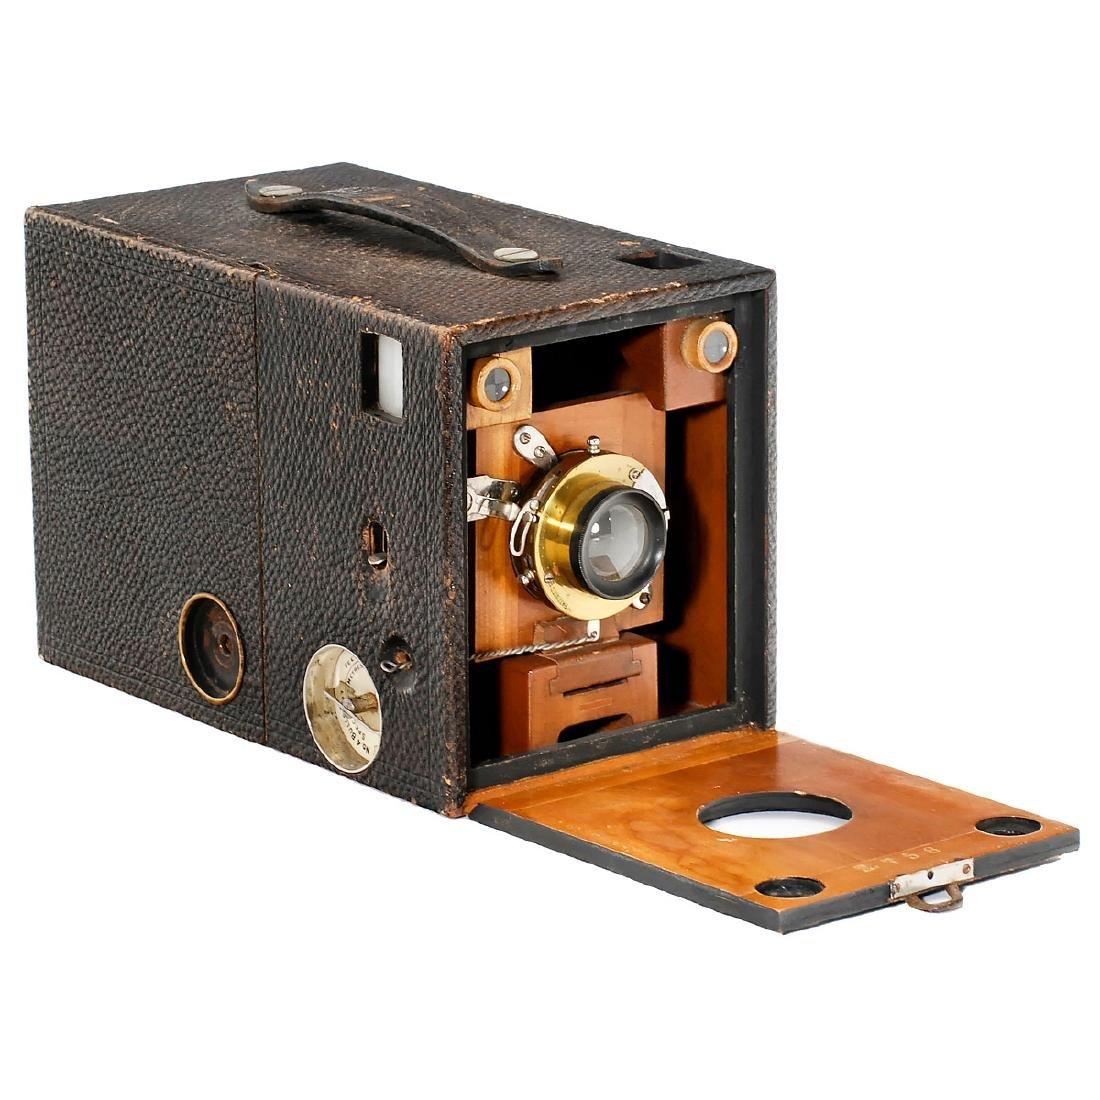 Kodak No. 4 Bull's-Eye Special, 1898